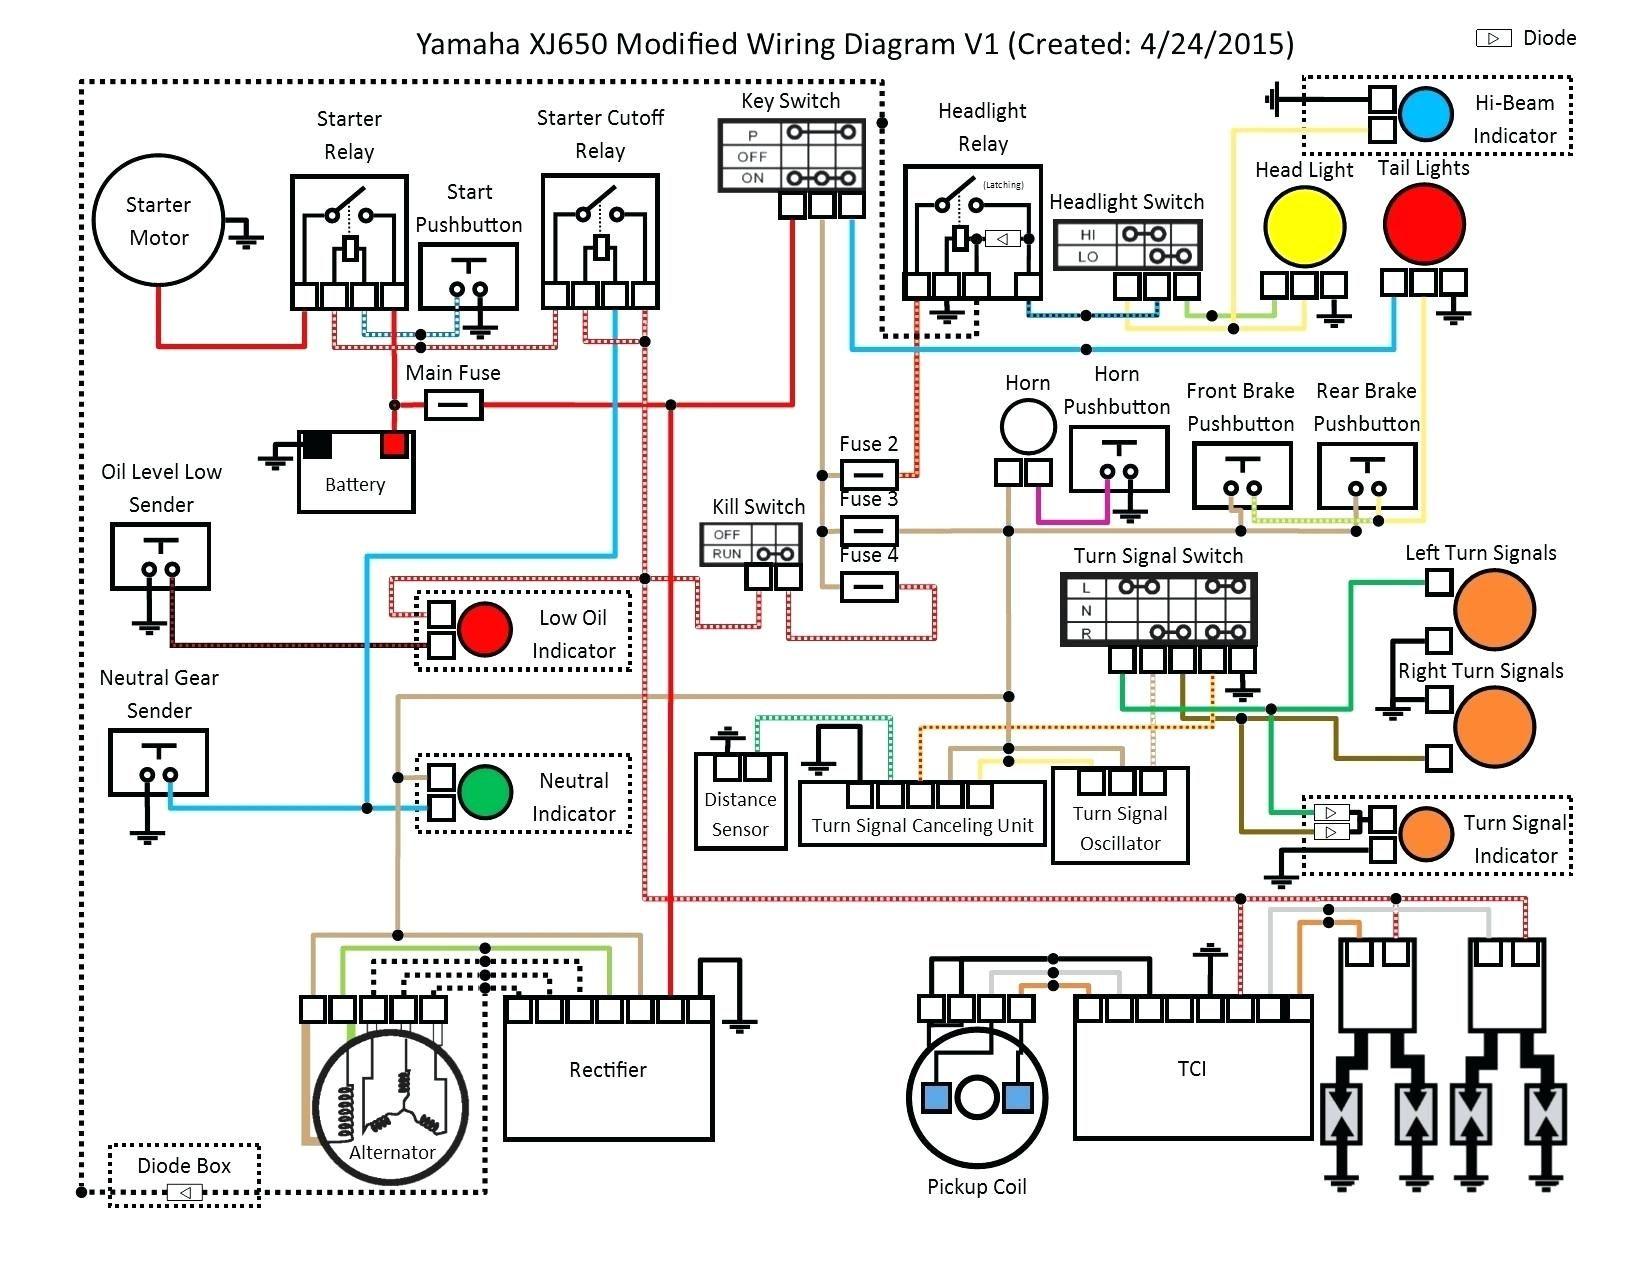 Honda Xrm 125 Electrical Wiring Diagram Lukaszmira Com At